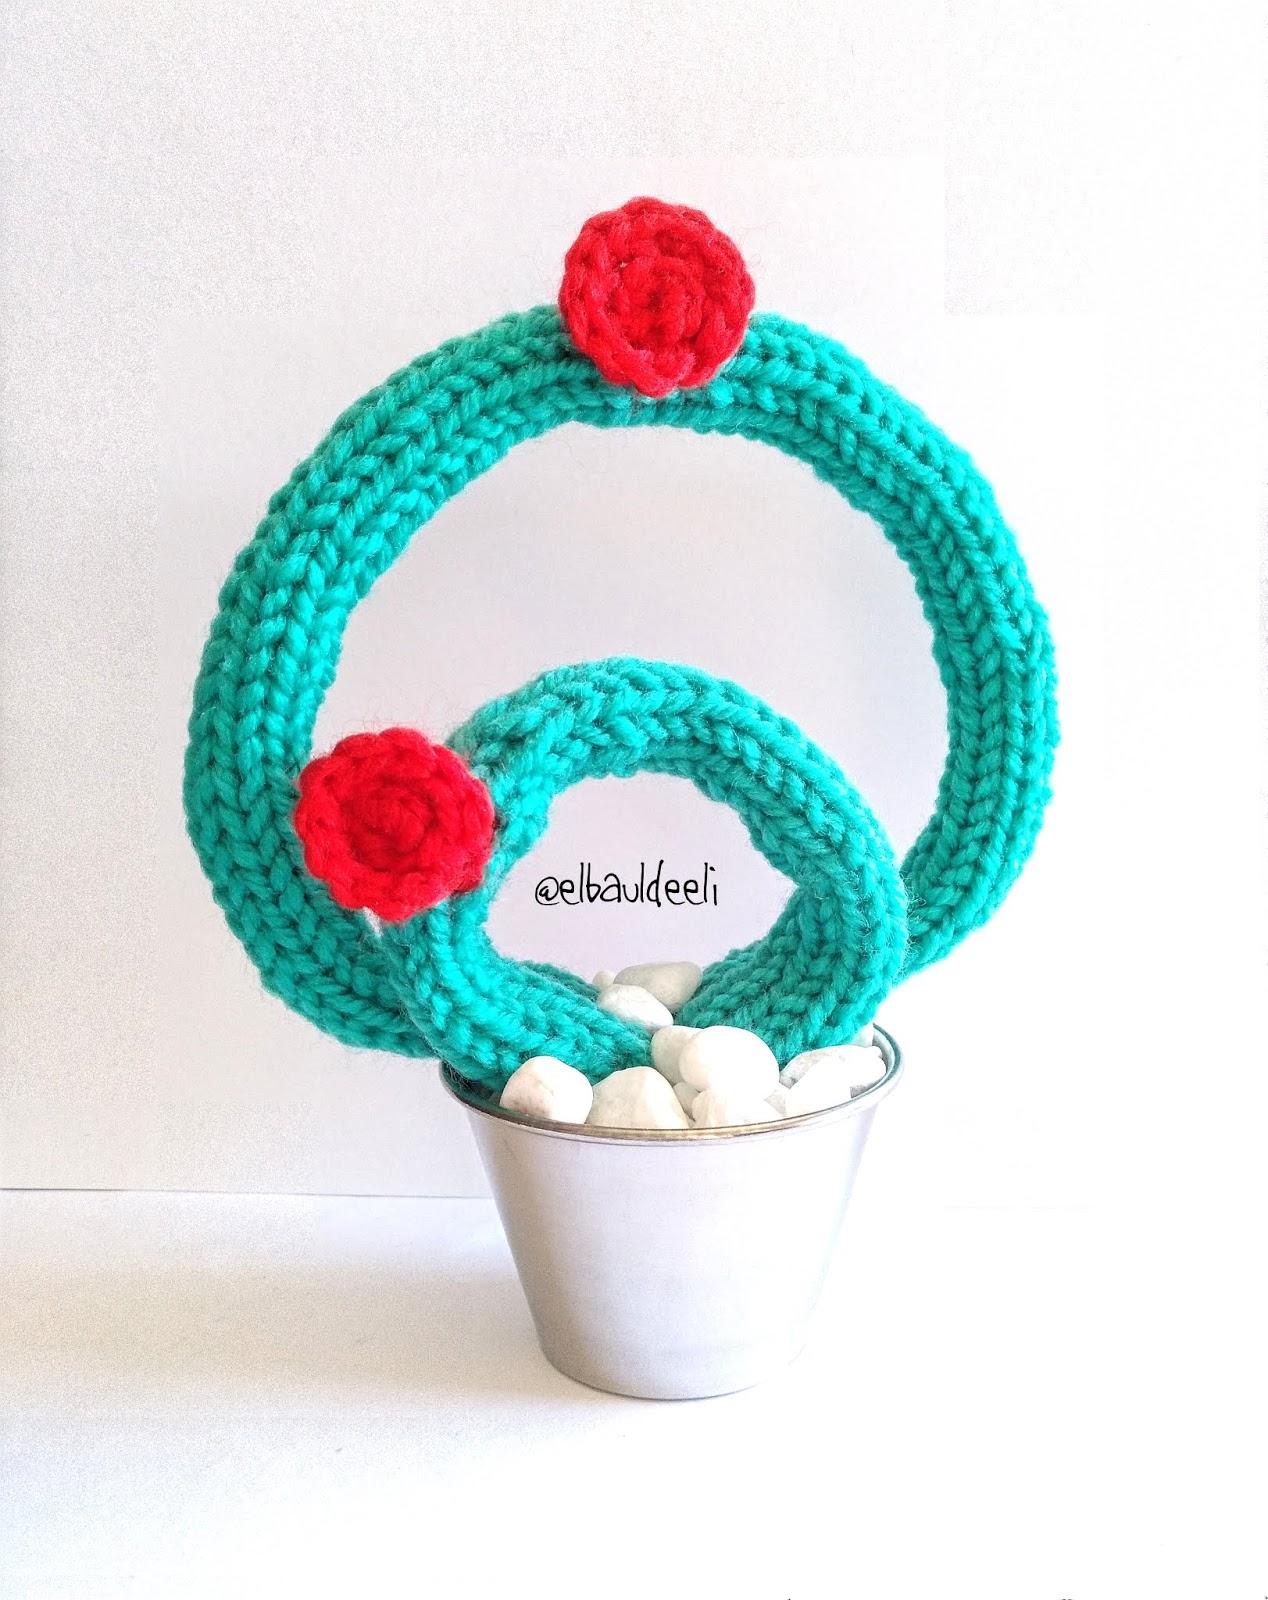 cactus, lana, handmade, tricotar, decoración, divertida